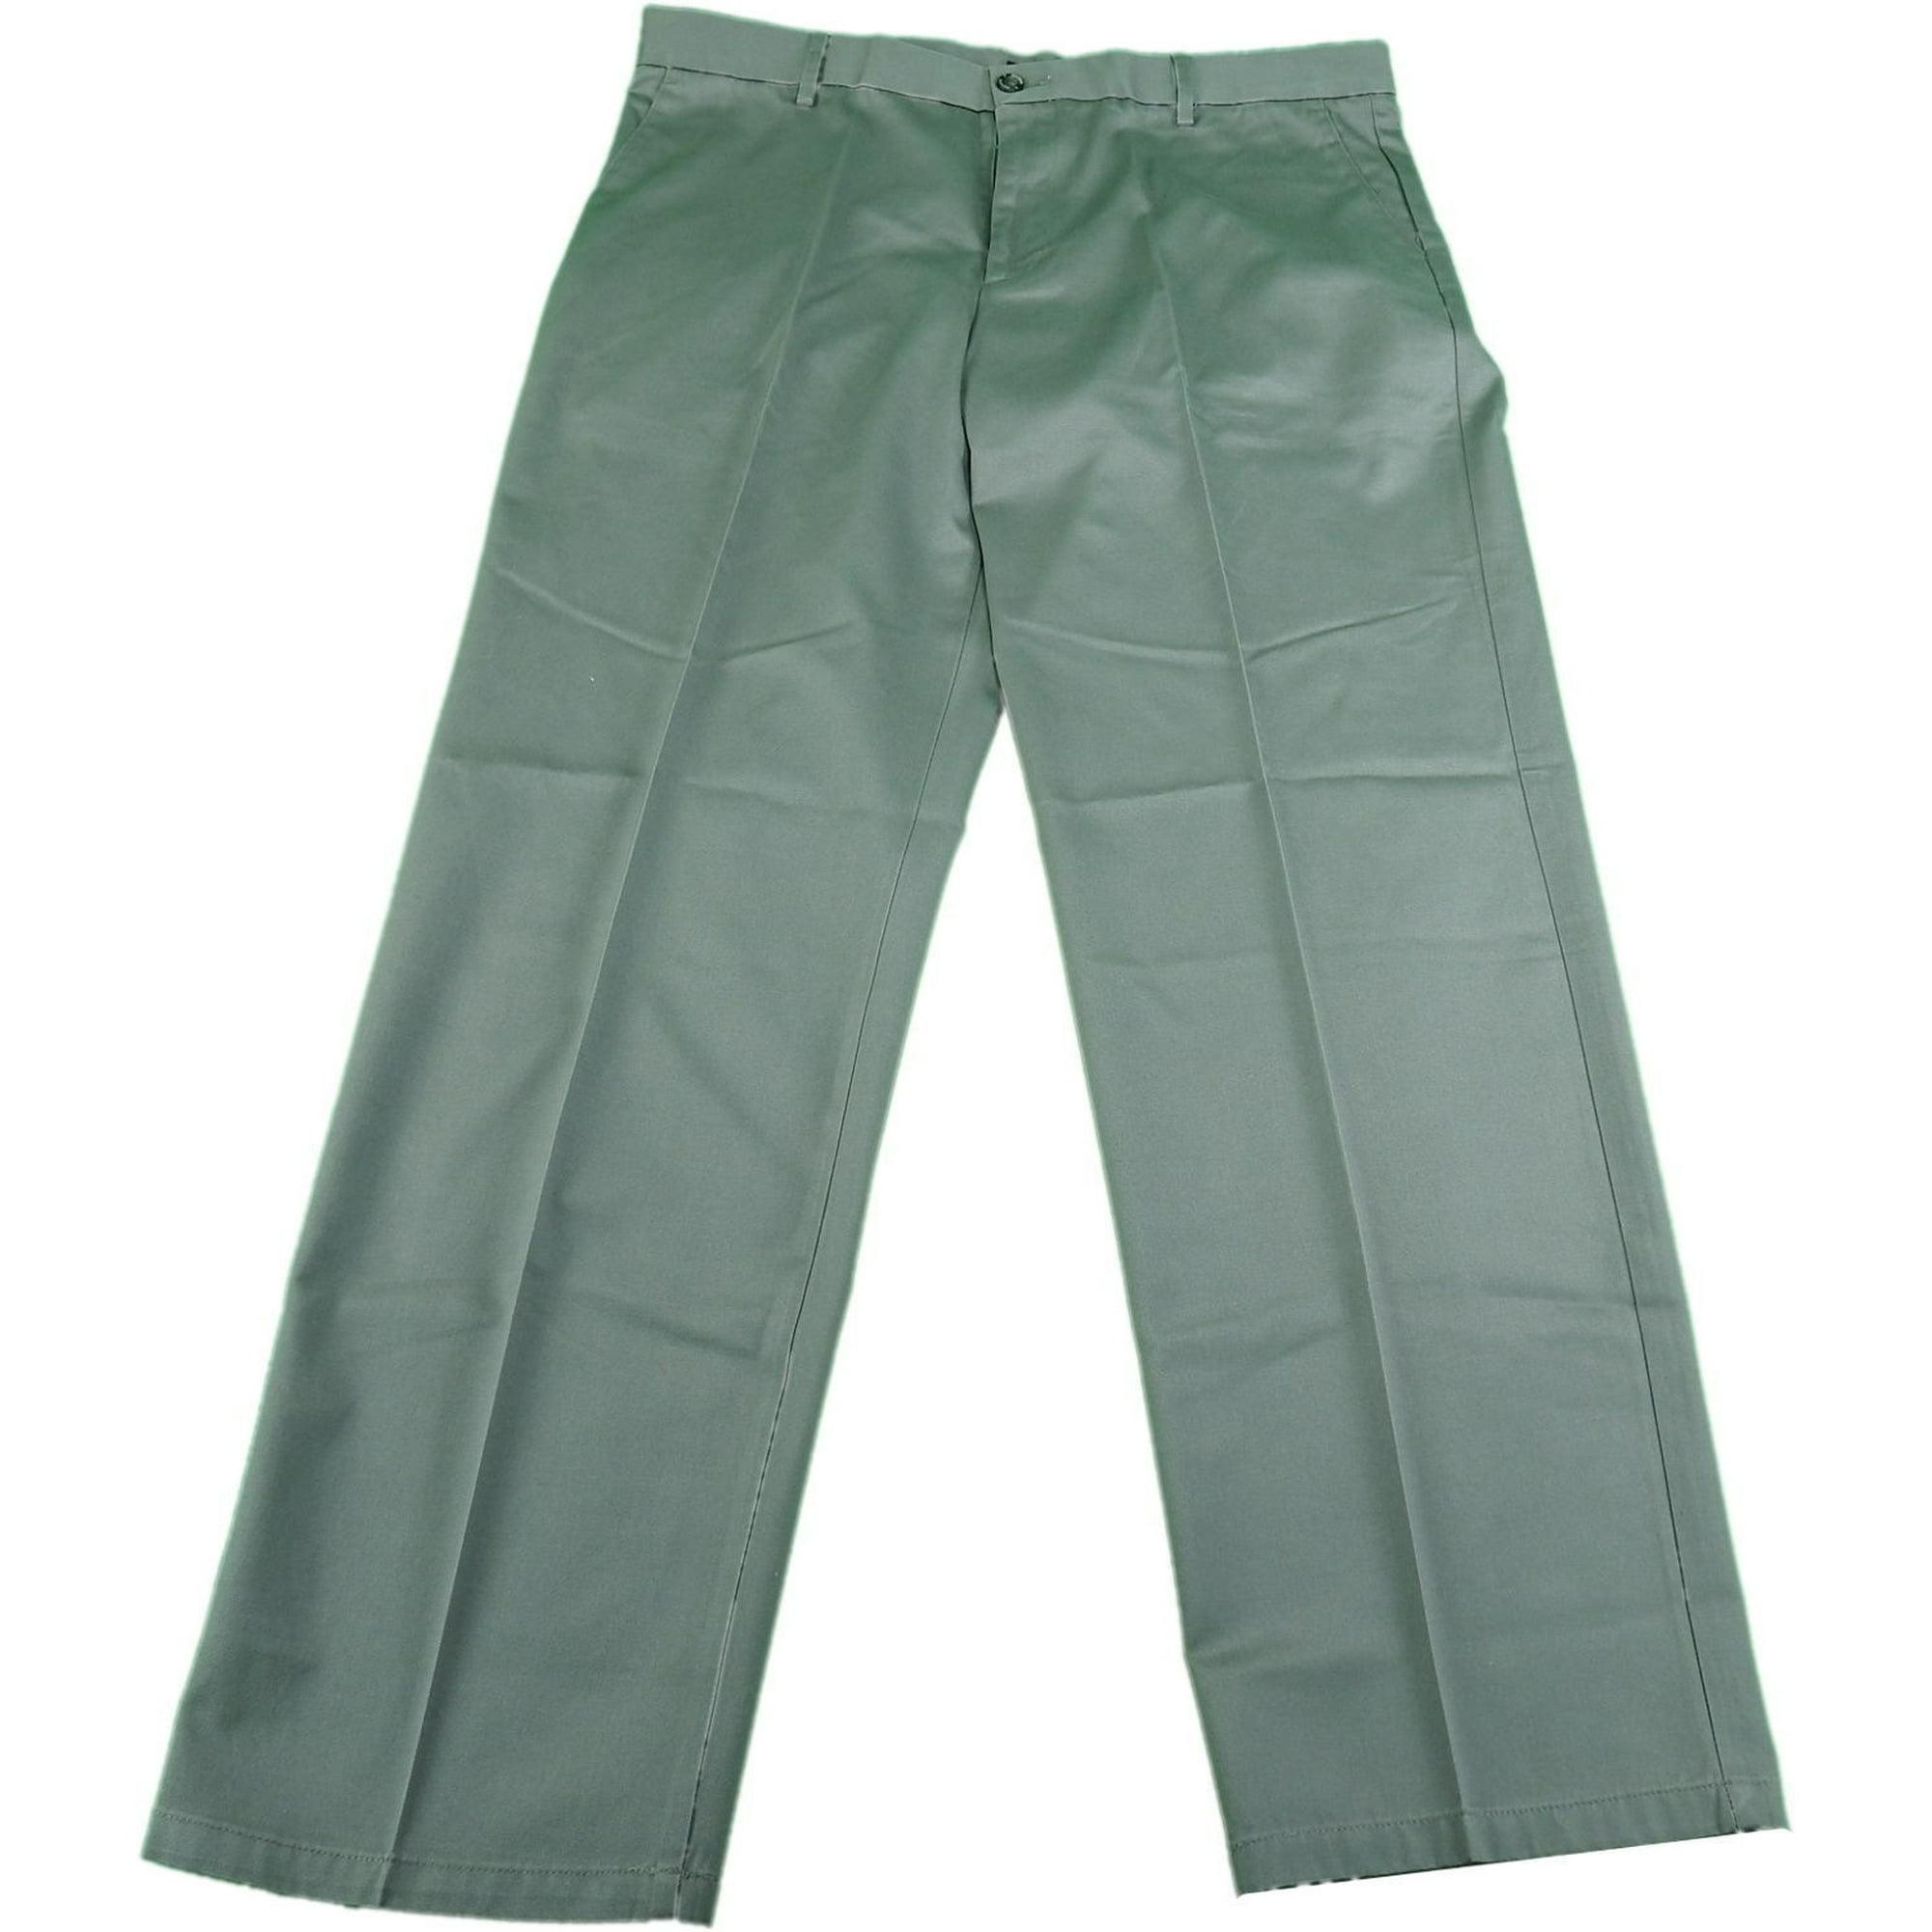 e47ff2338b Dockers Mens Size 38 x 32 Classic Fit Flat-Front The Original Signature  Khaki Pants, Grey